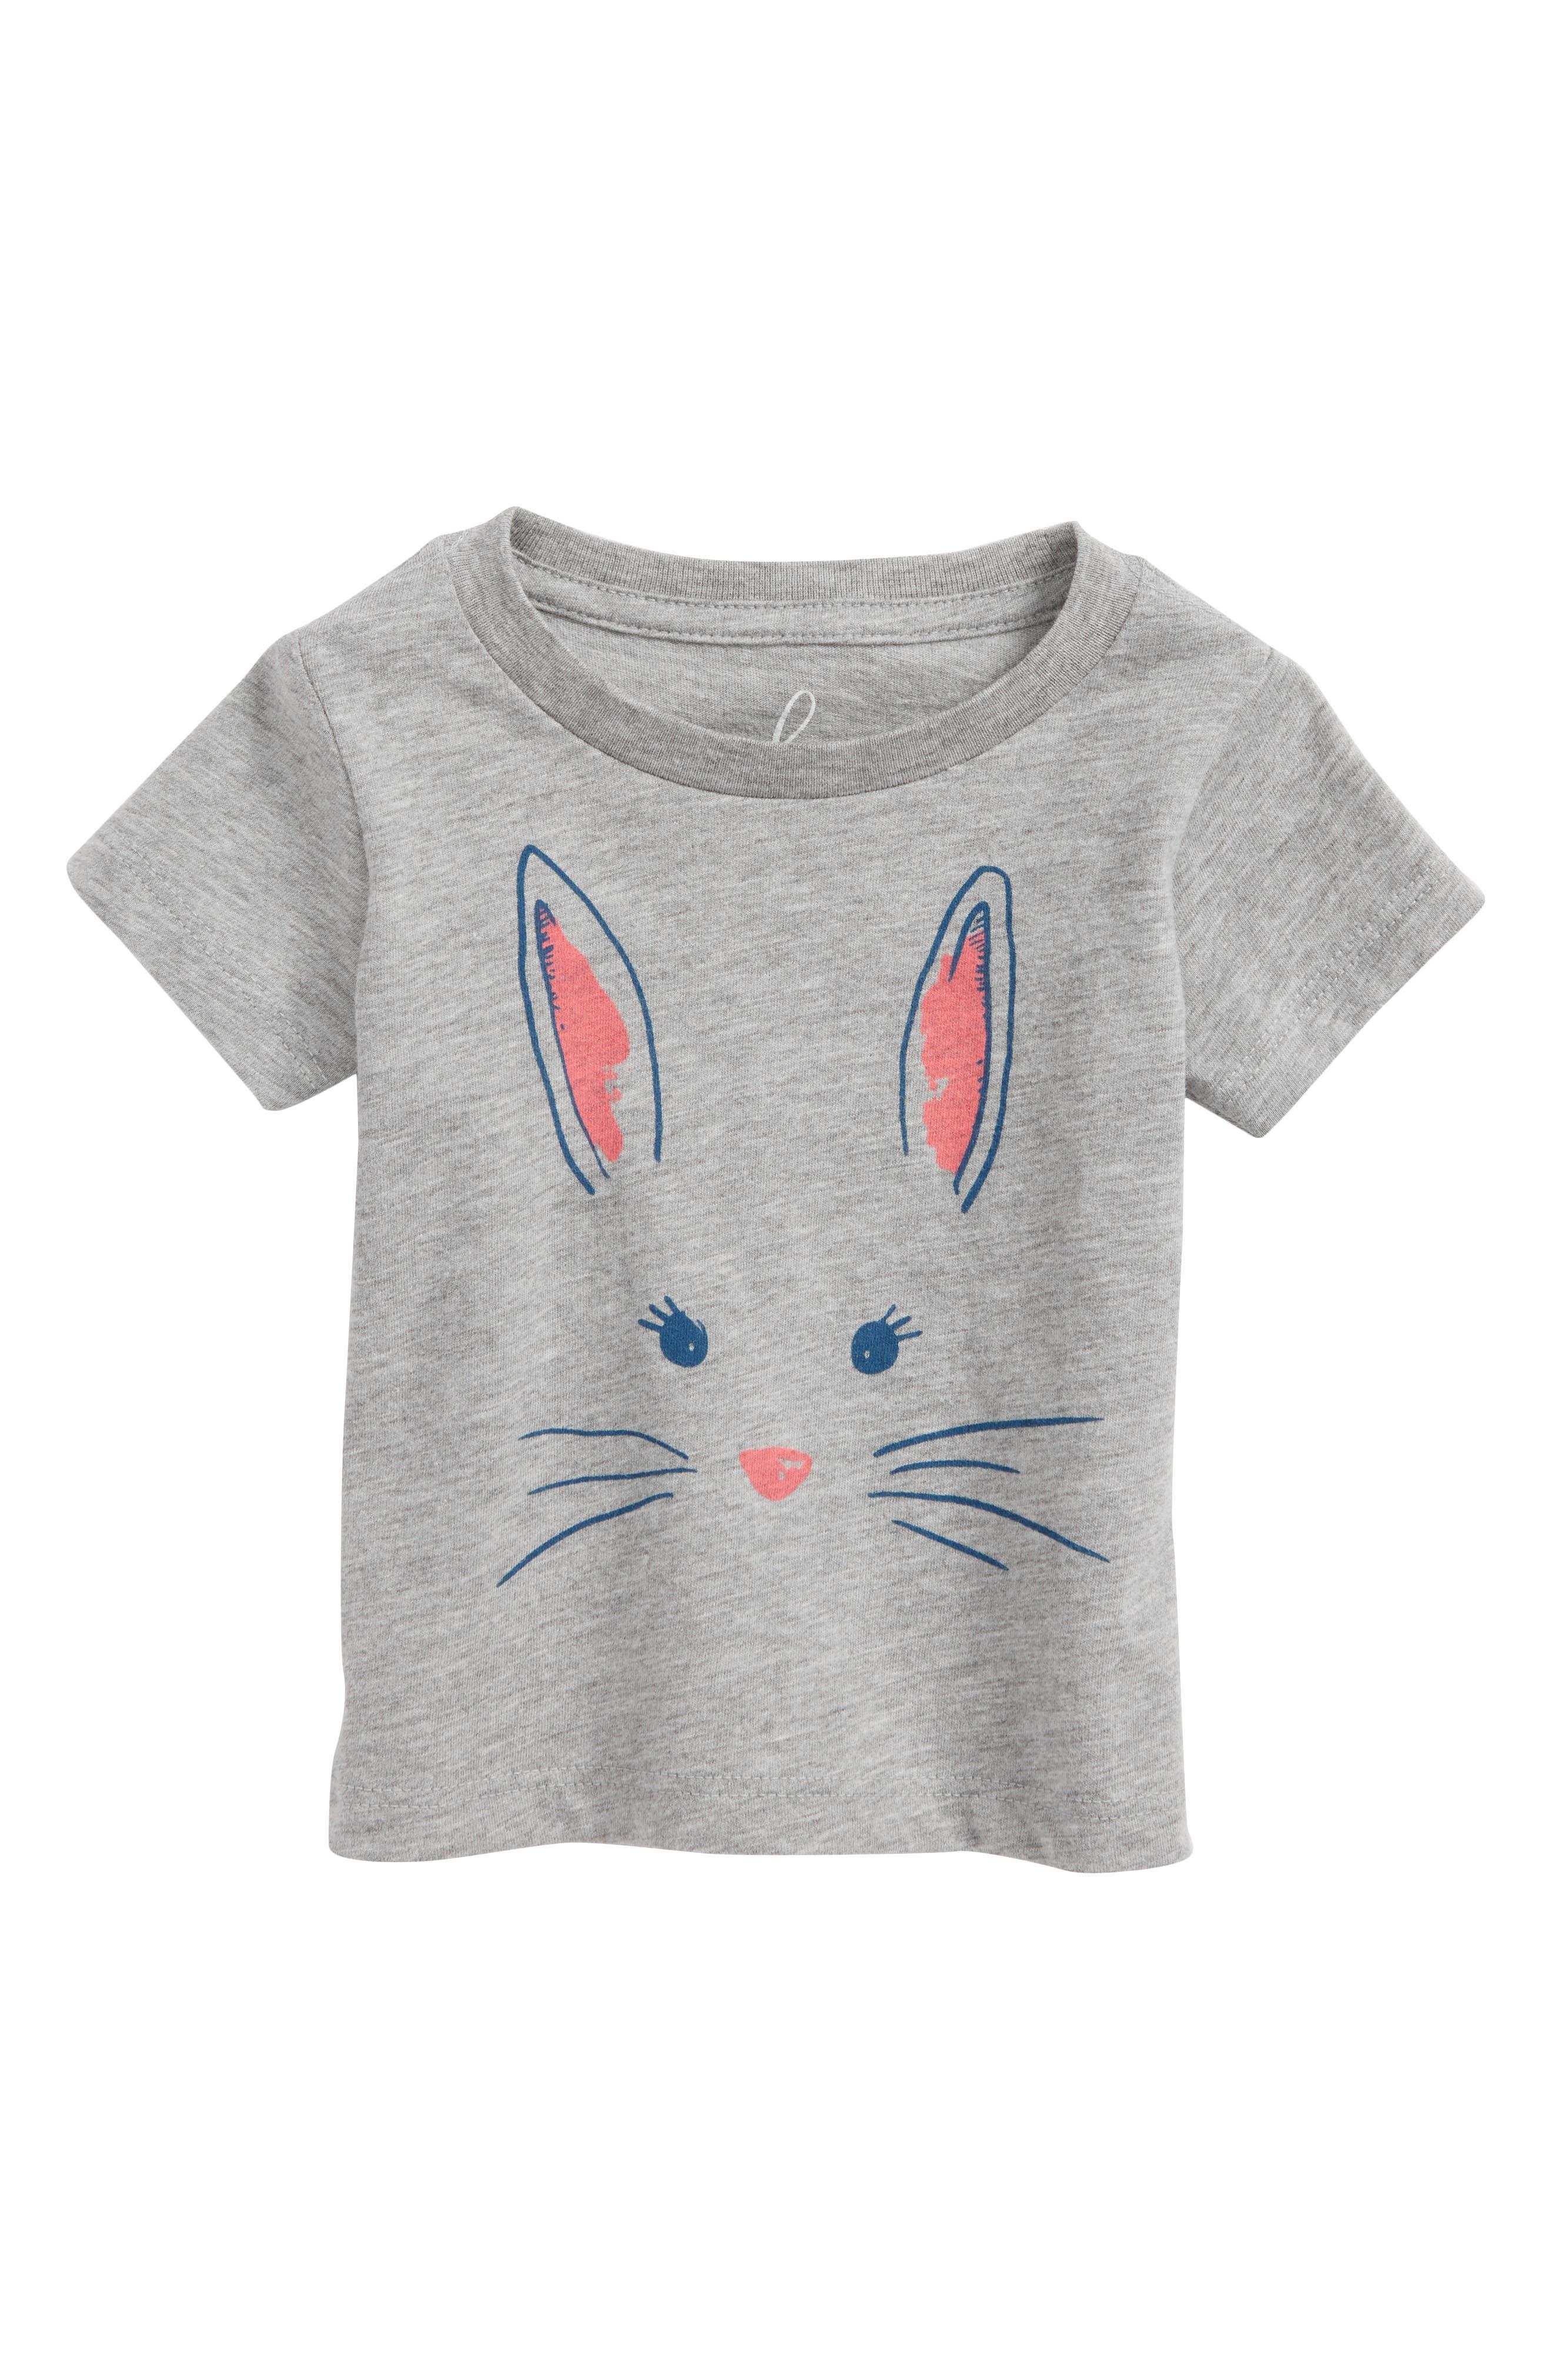 Peek Bunny Tee,                         Main,                         color, 031